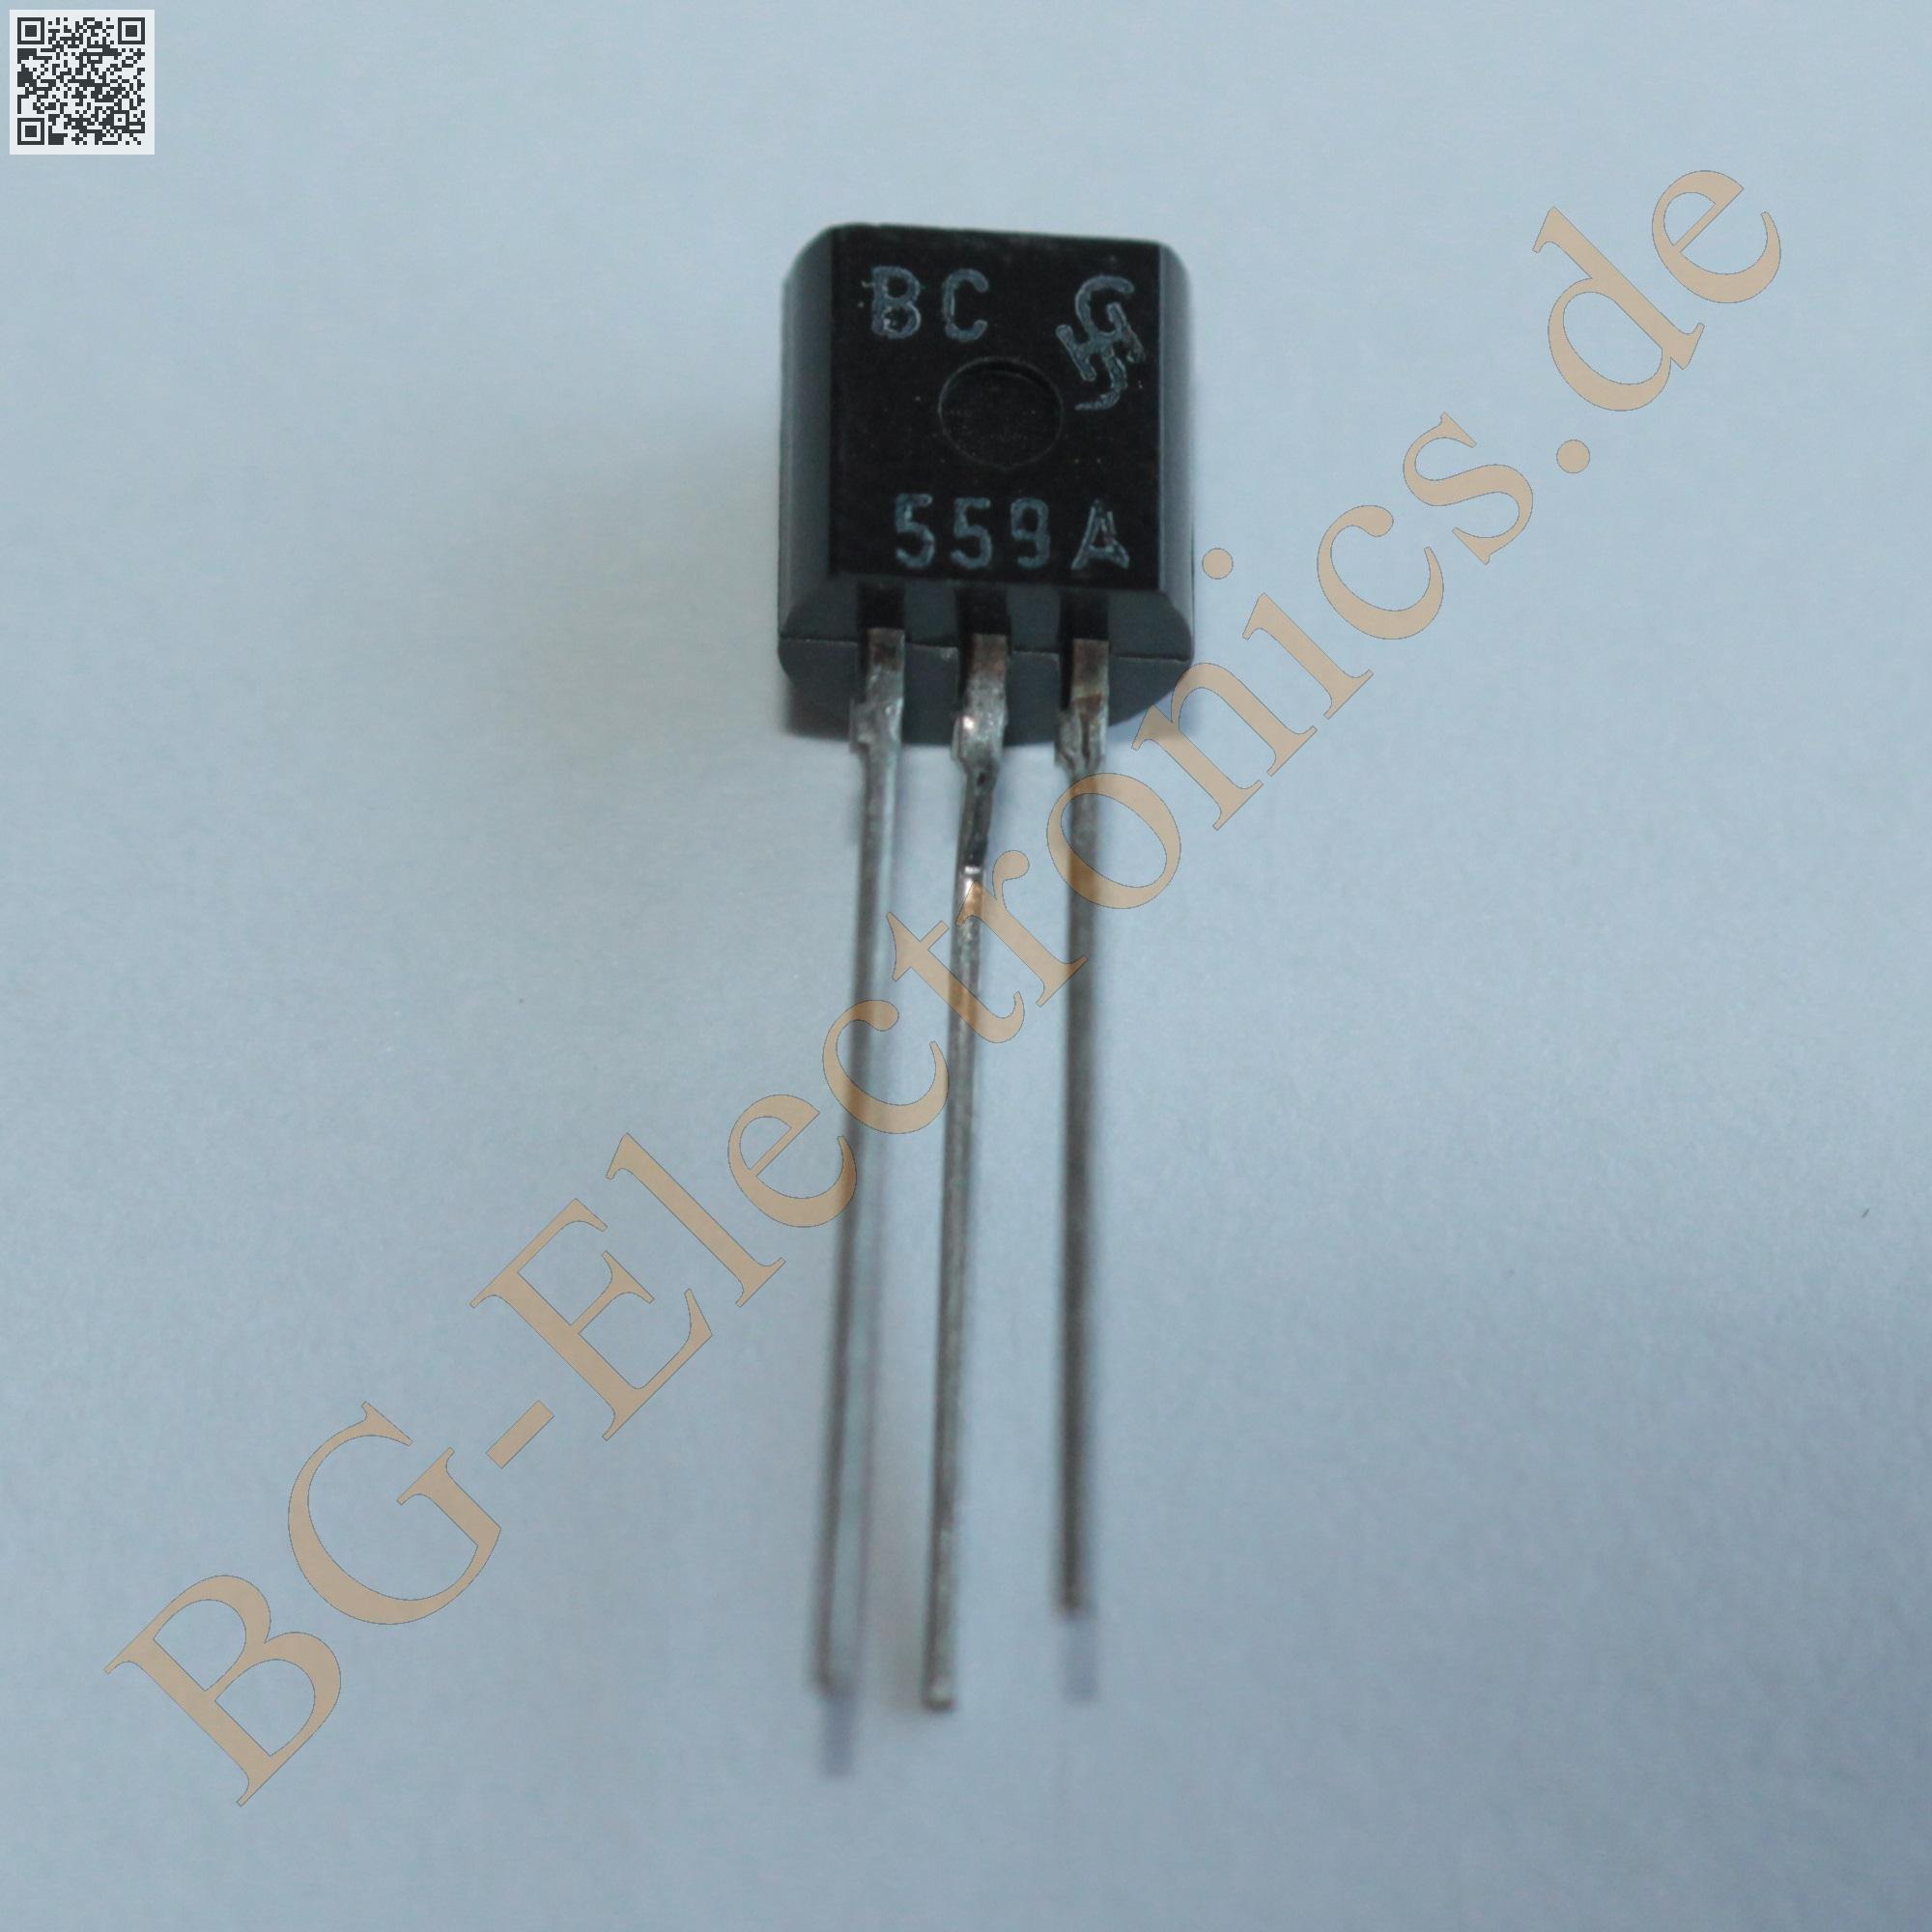 10 x bc559a pnp silicon transistor 30v 100ma 500mw siemens. Black Bedroom Furniture Sets. Home Design Ideas